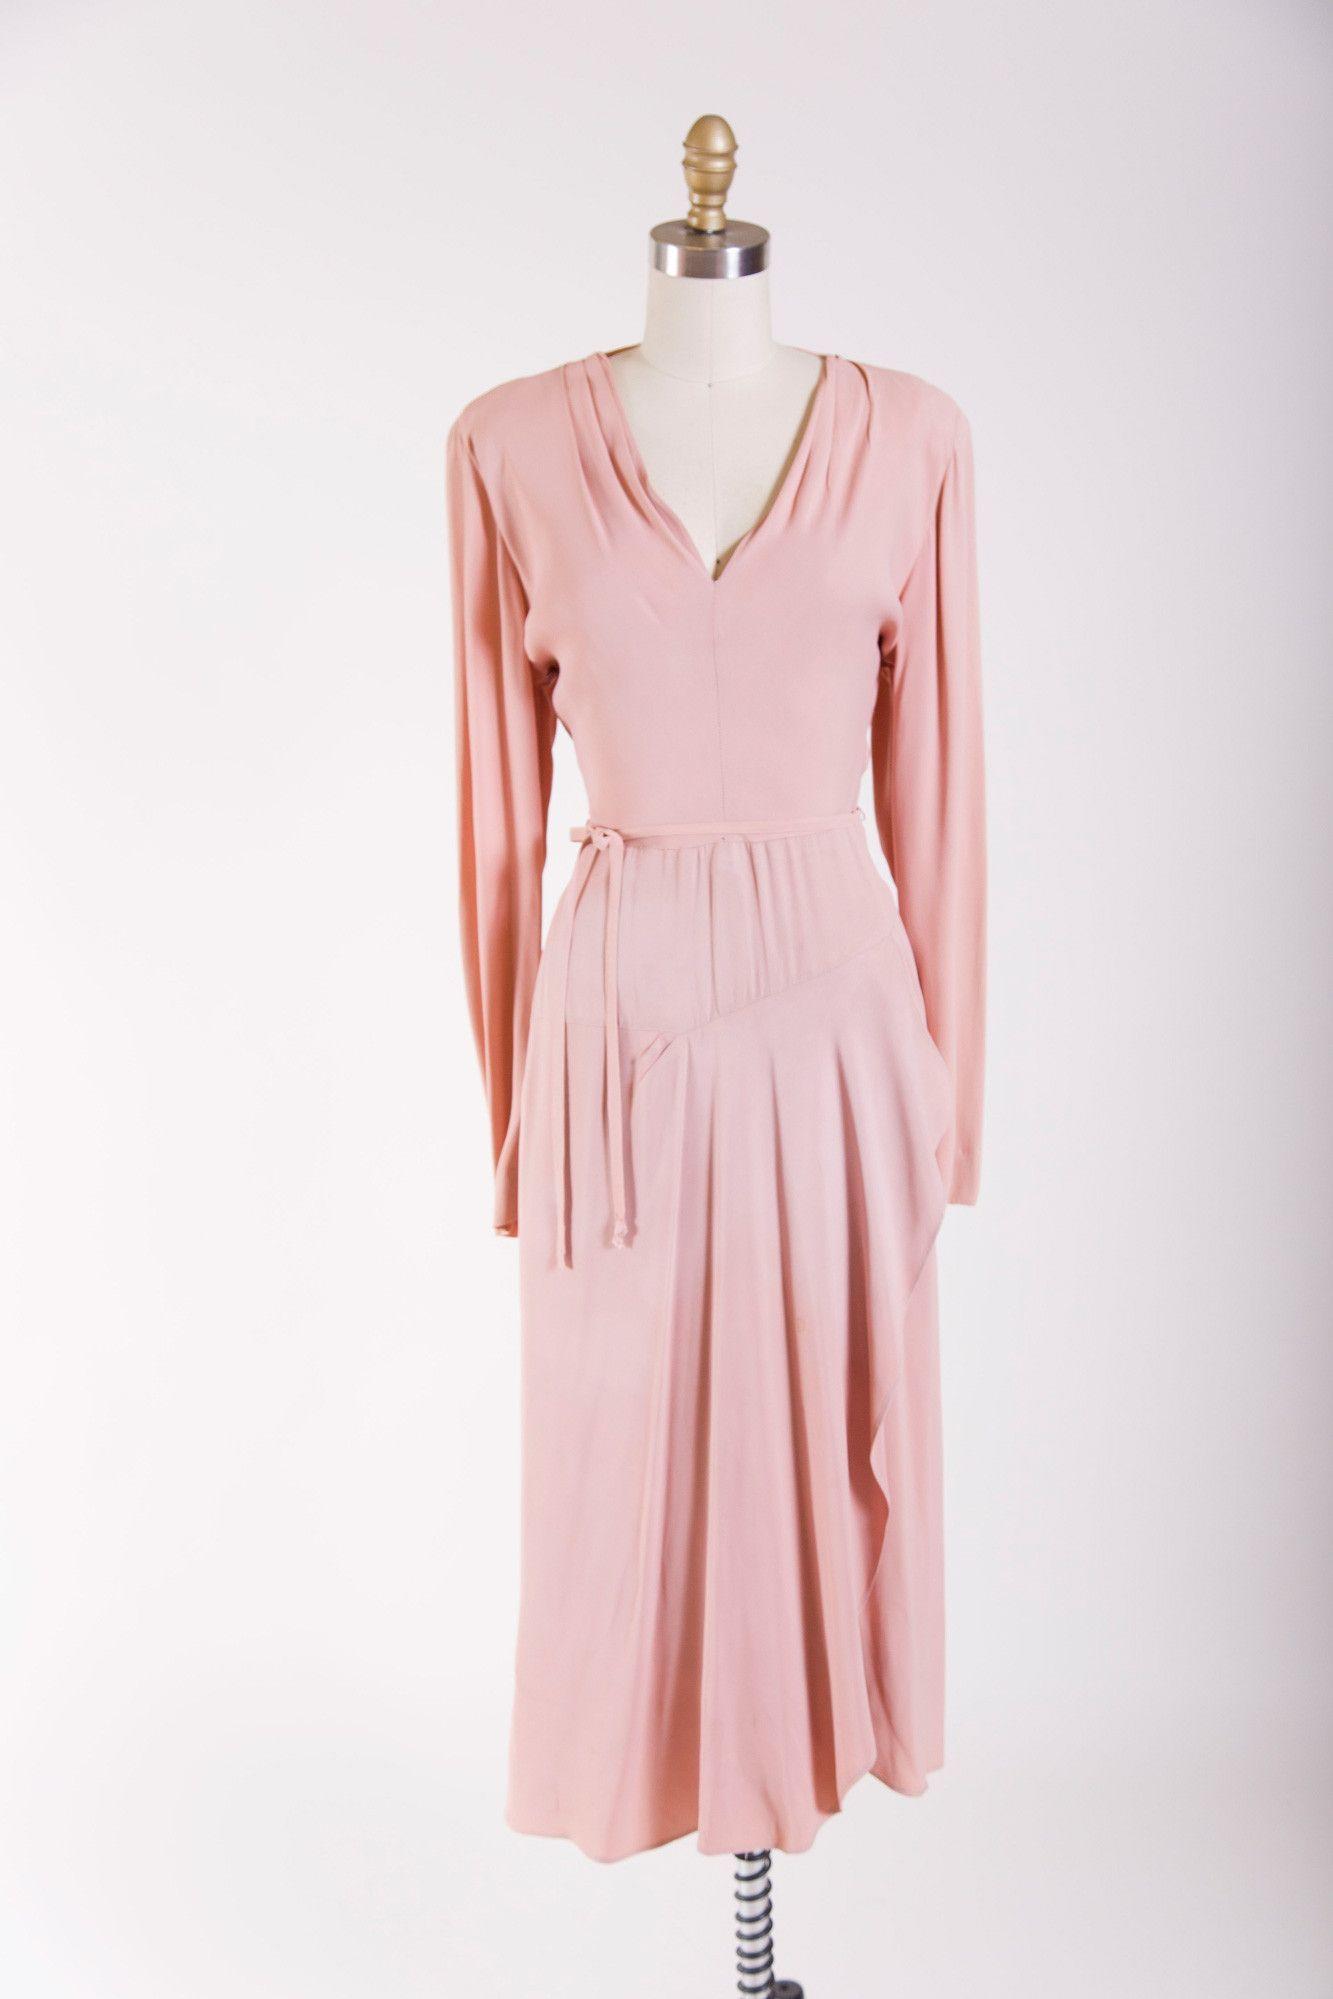 Dreaming blush dress s vintage clothes pinterest blush